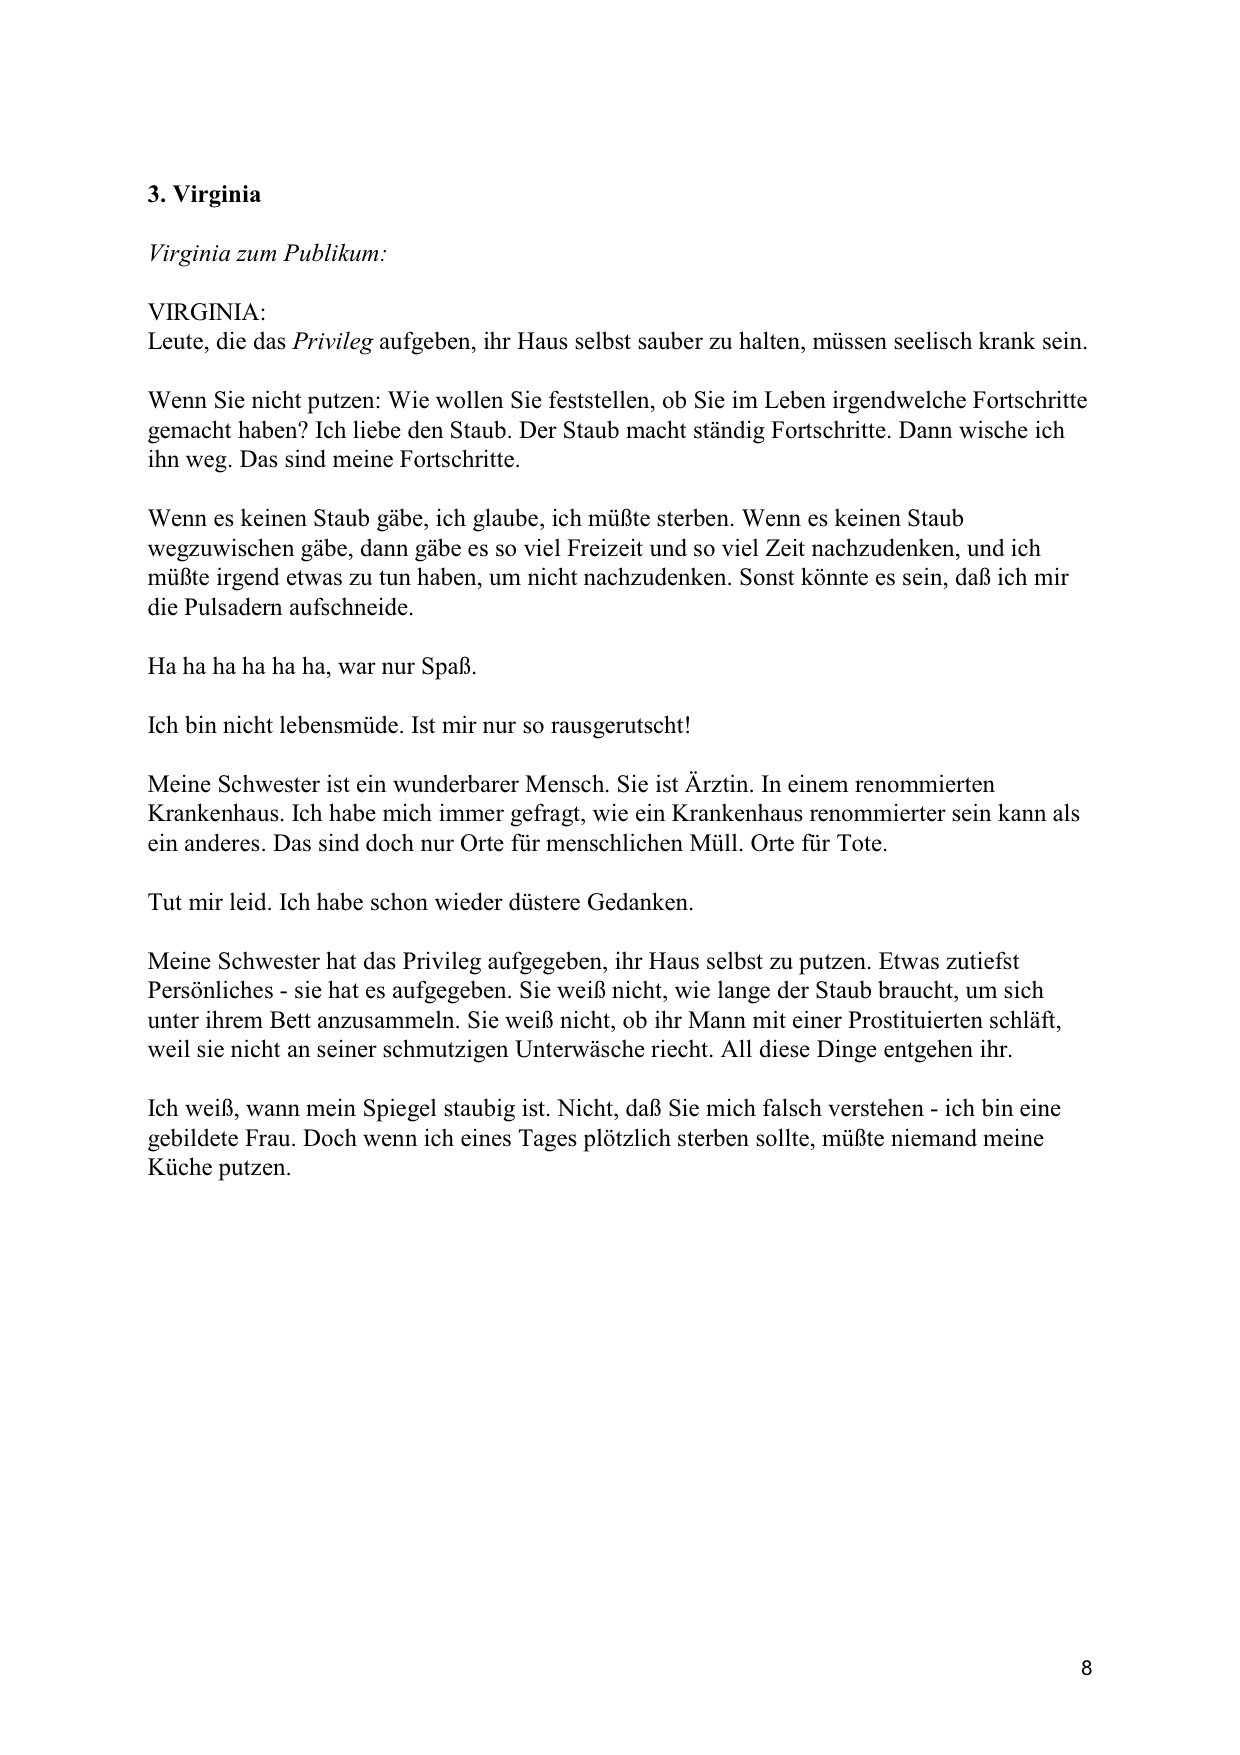 THE CLEAN HOUSE | Translations | Sarah Ruhl